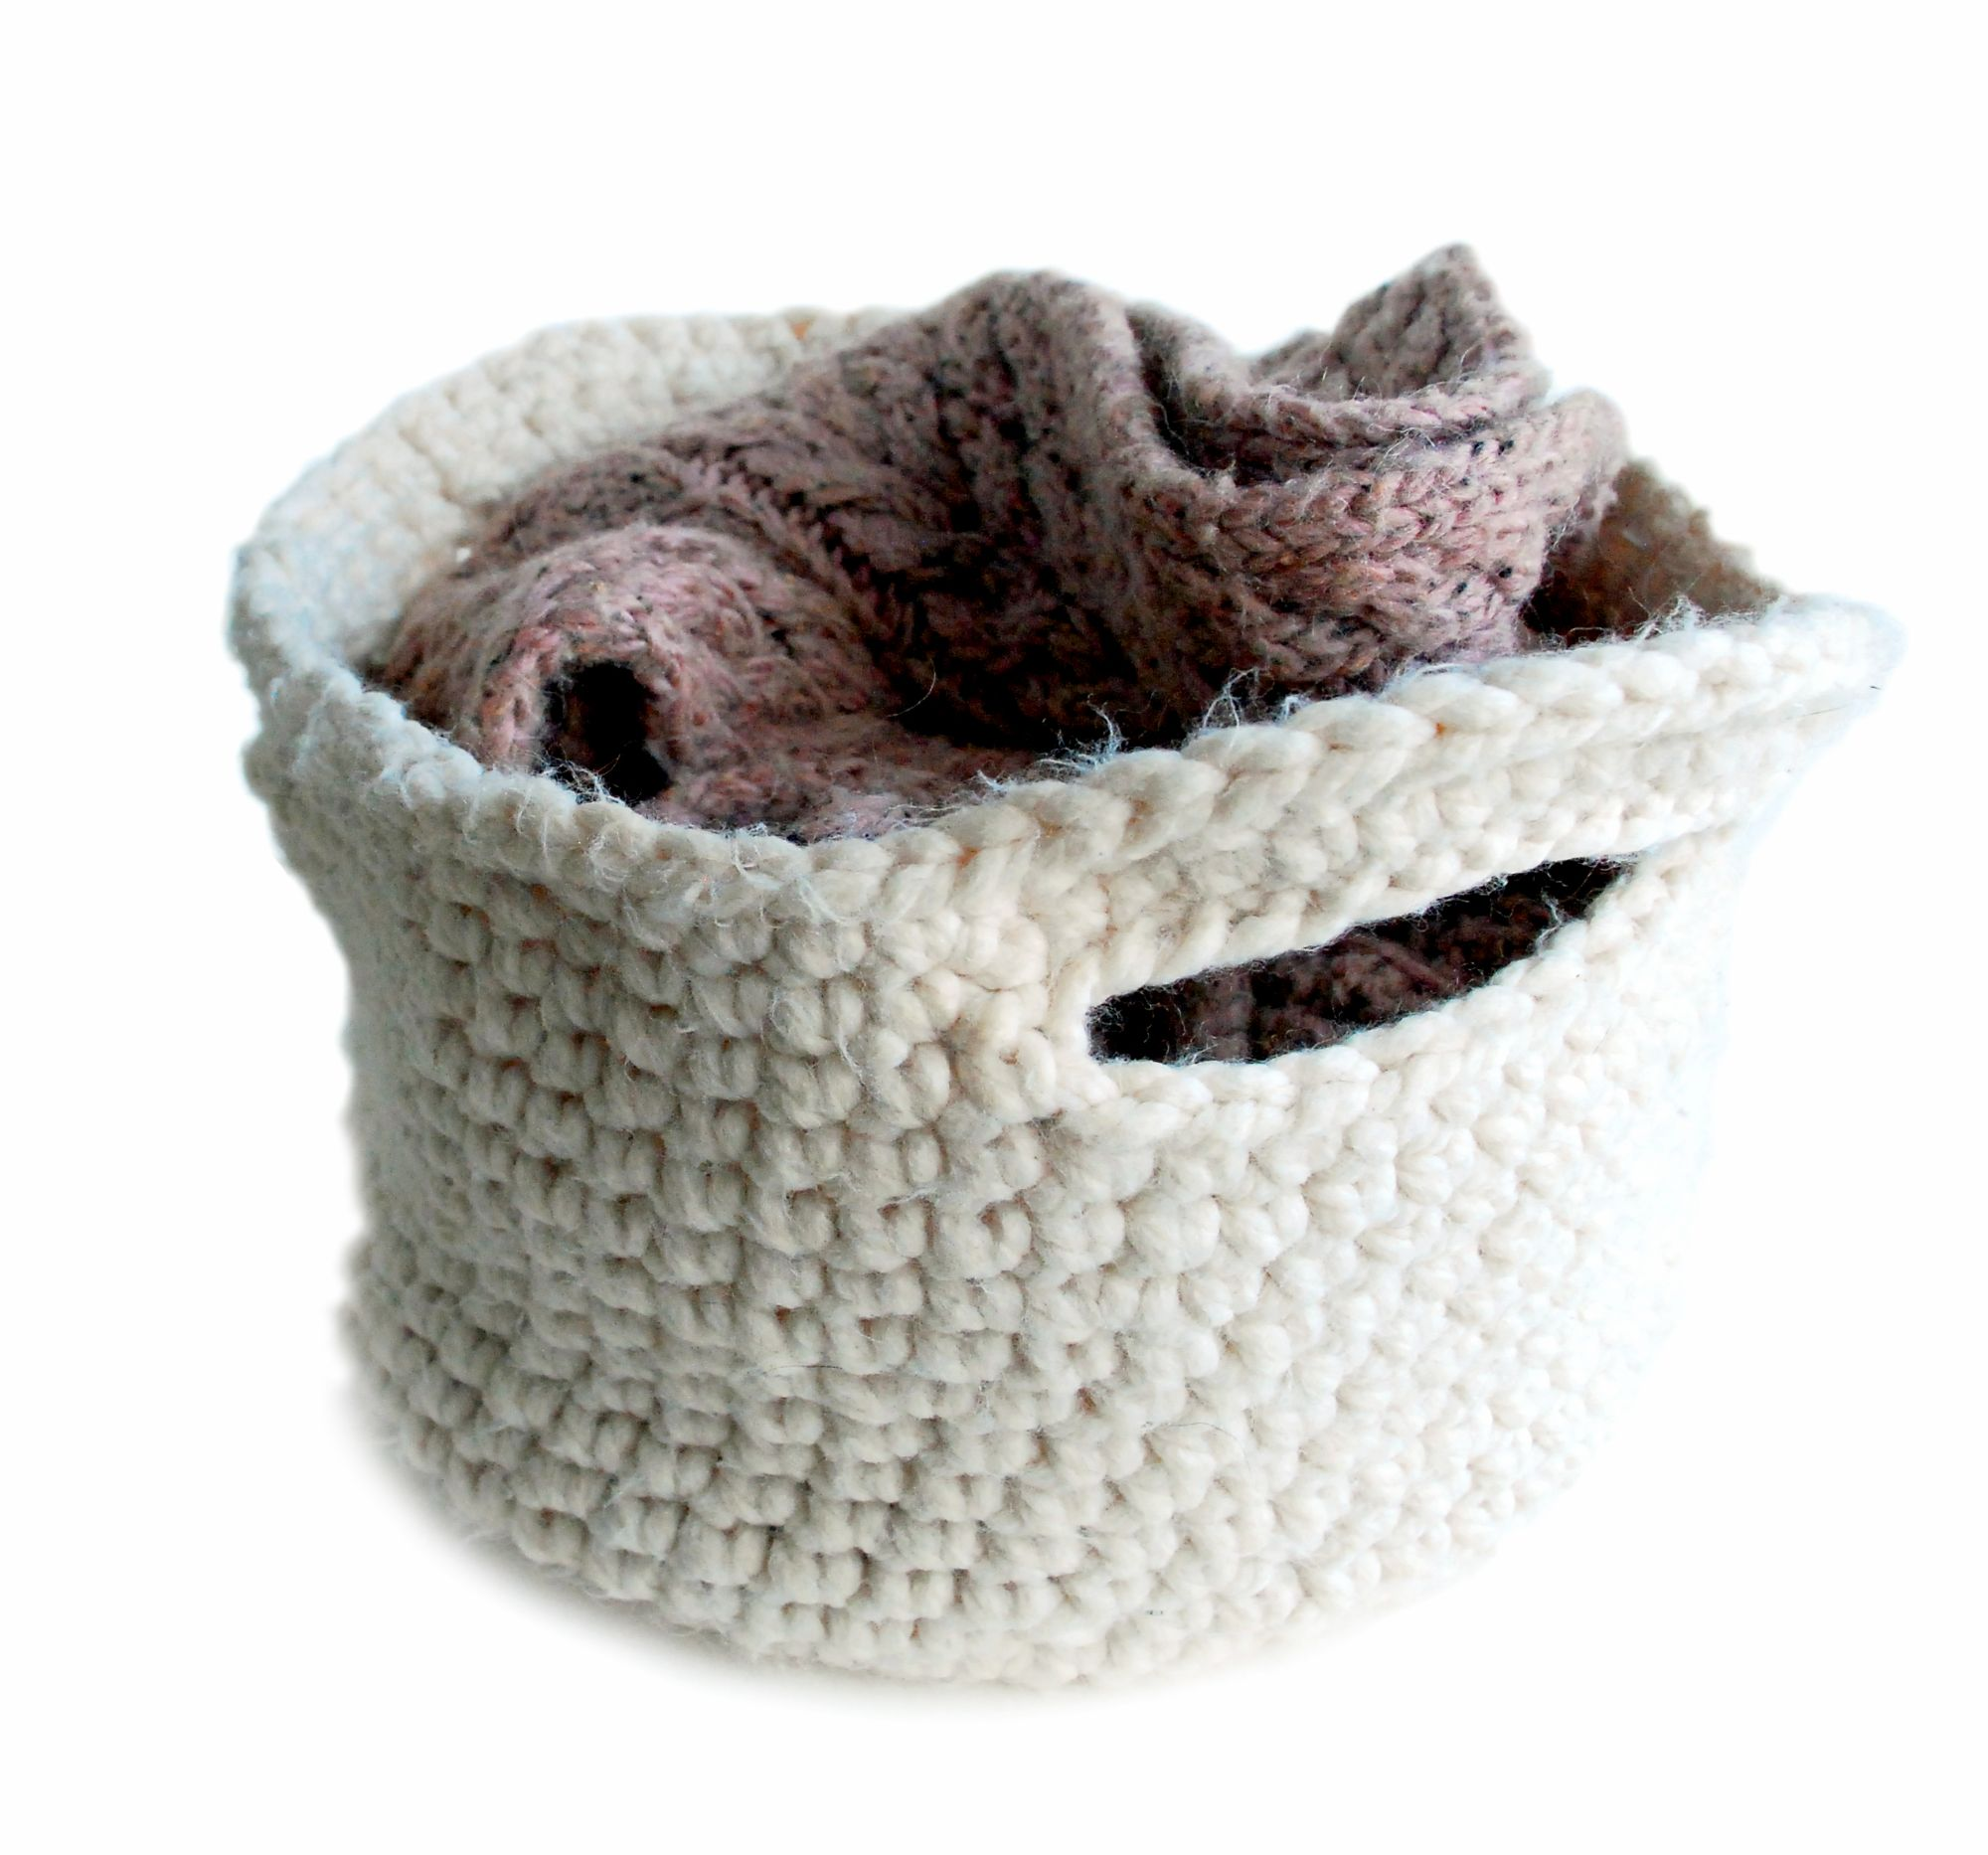 Chunky crocheted basket in cream yarn